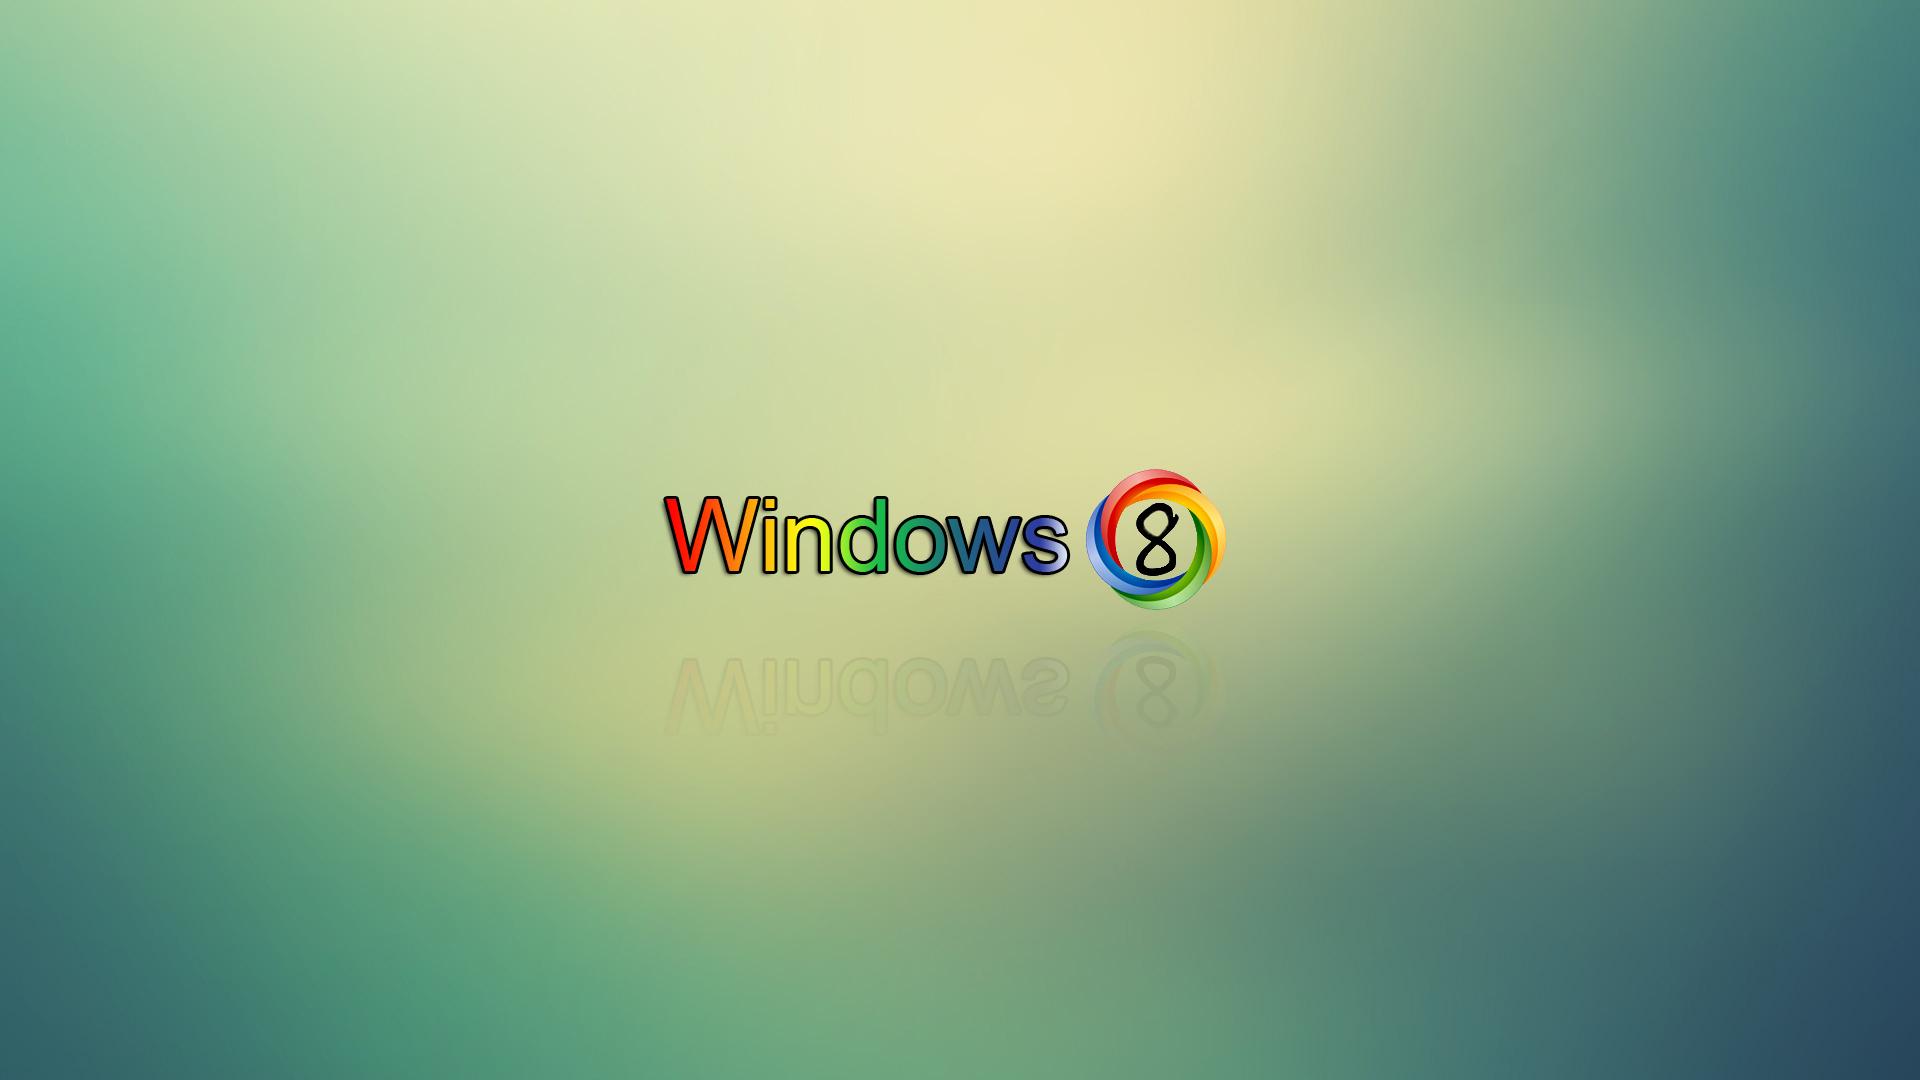 windows 8 wallpapers 130 high resolution backgroundswindows 8 high 1920x1080